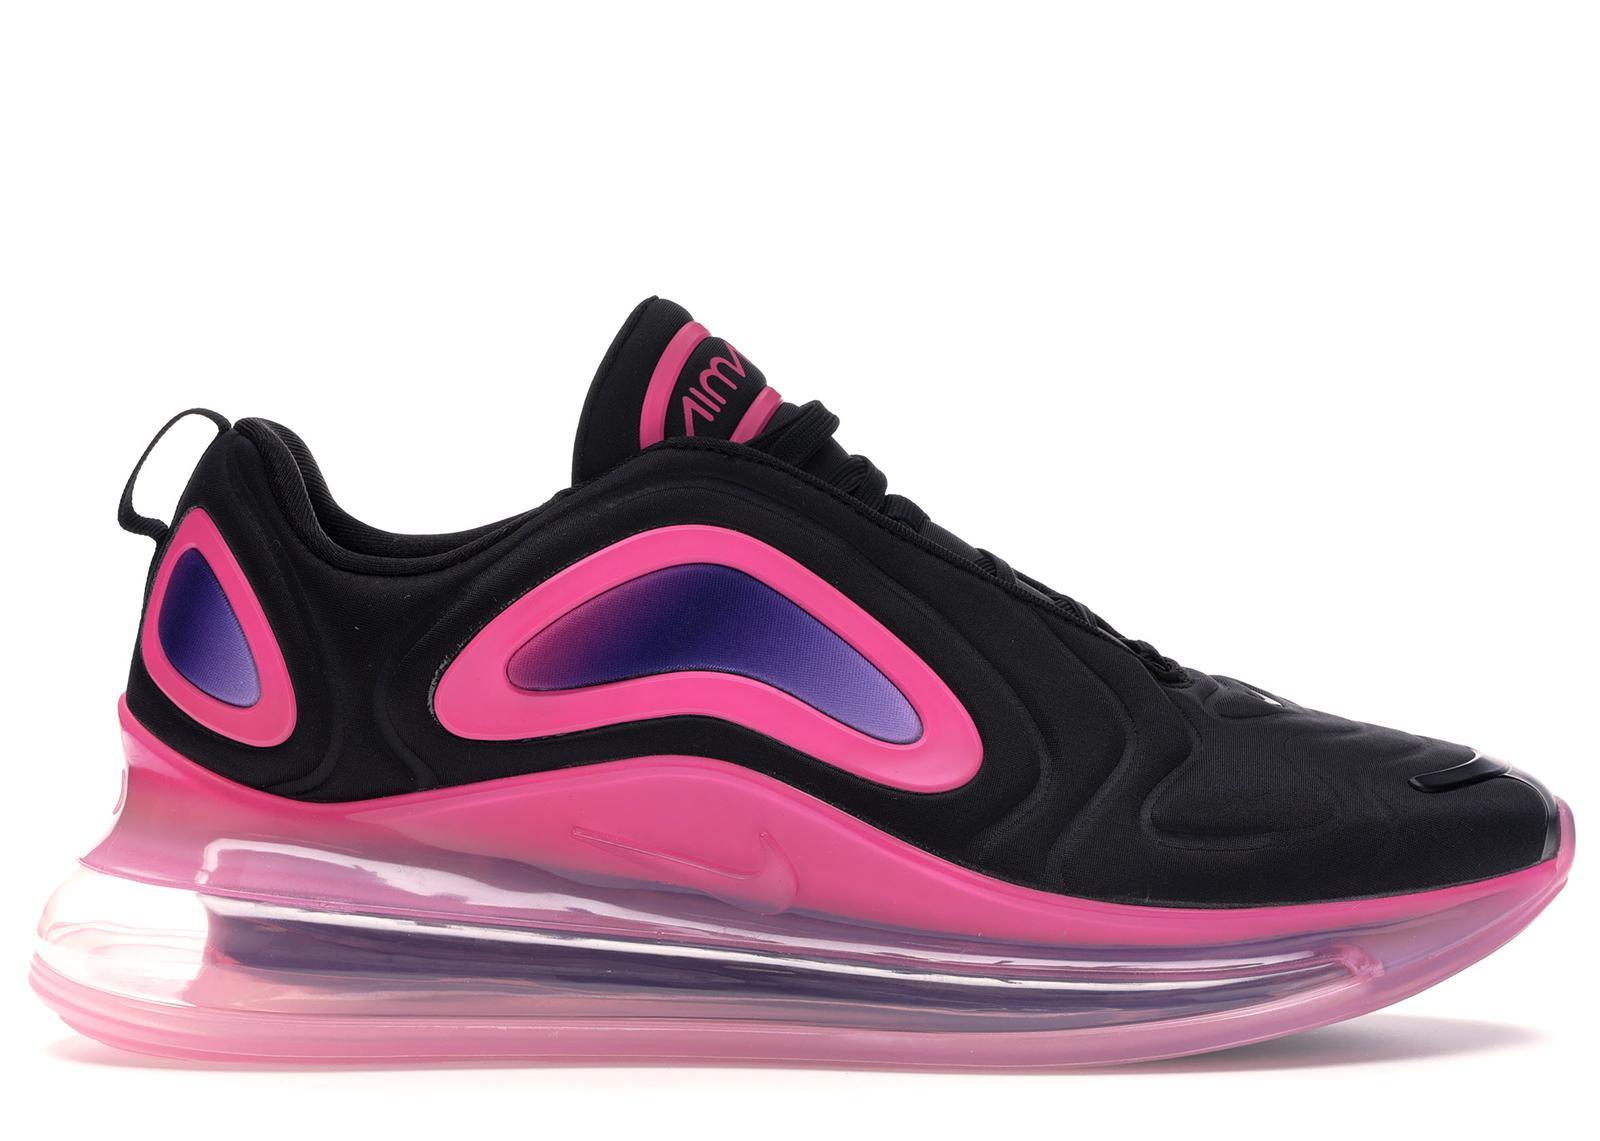 Nike Air Max 90 Raspberry Red Club Pink Womens Shoes,95 nike